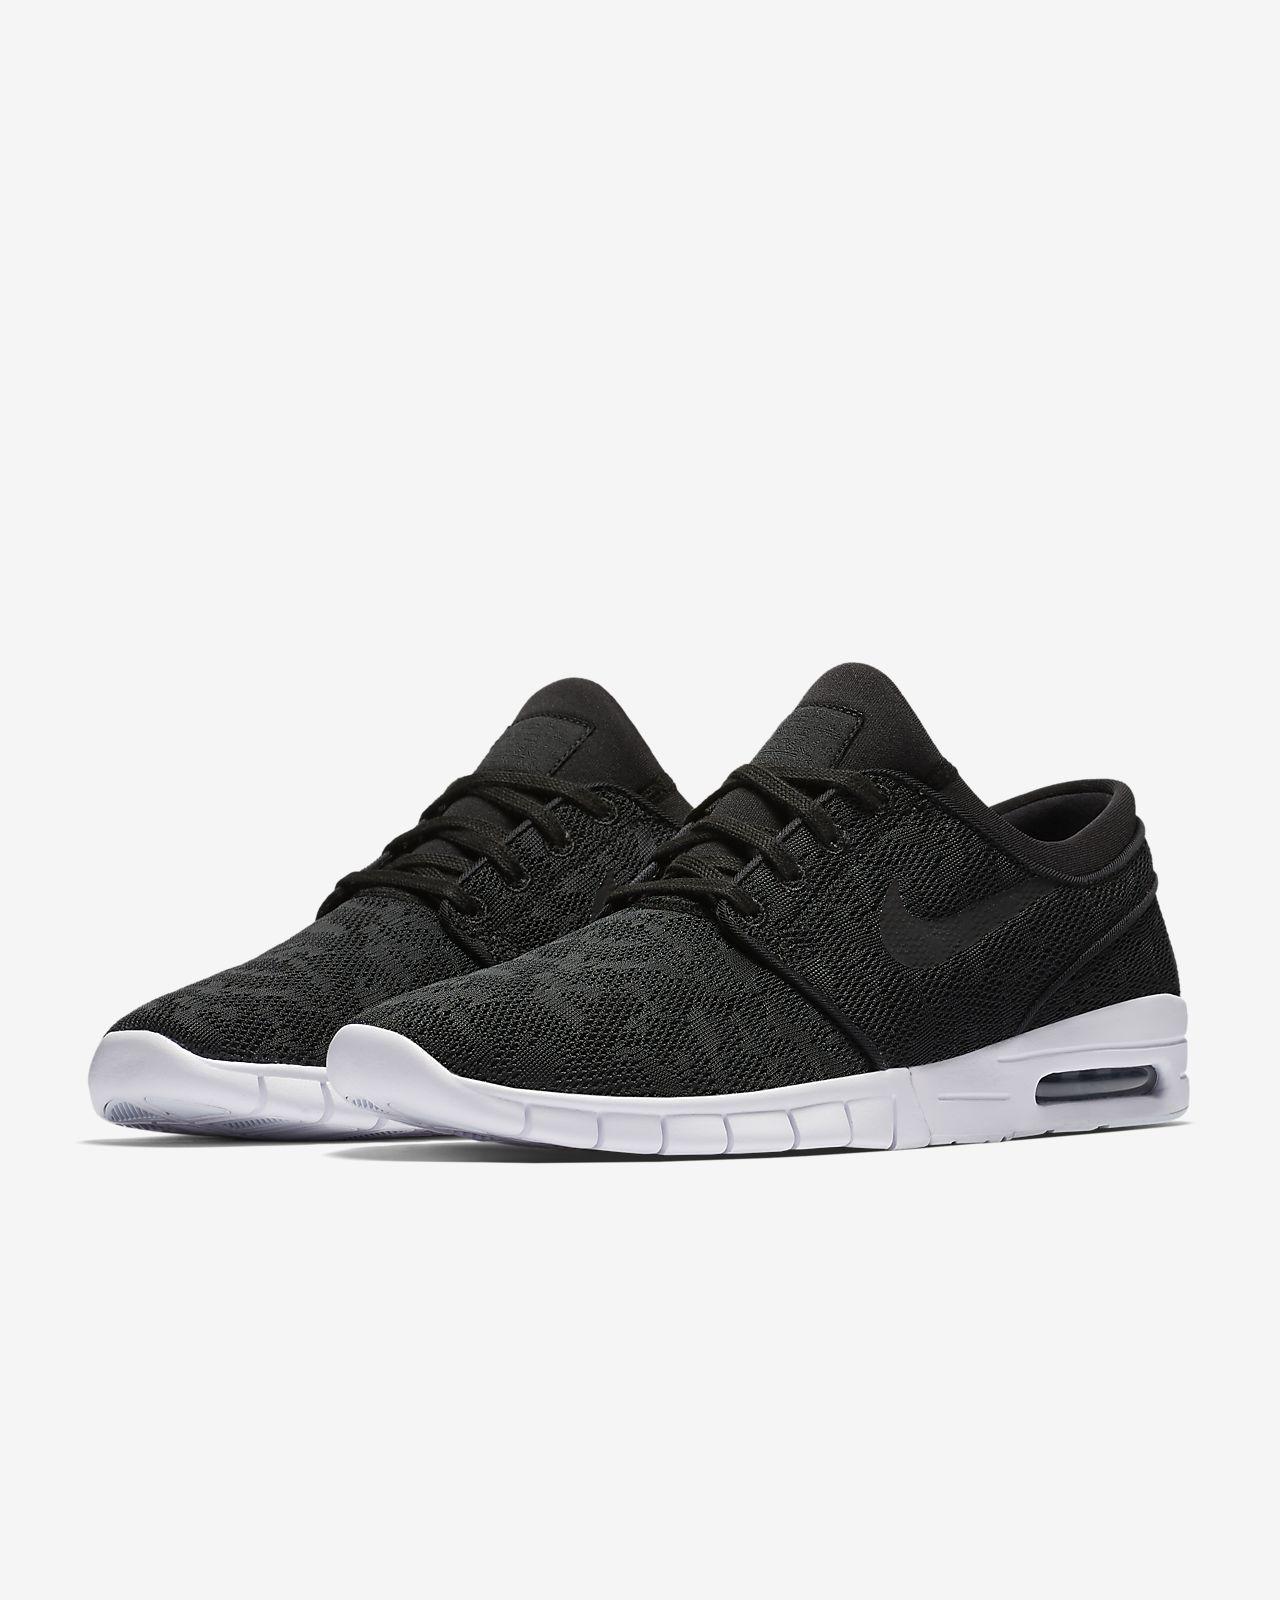 7fcc0cd2d9b Nike SB Stefan Janoski Max Skate Shoe. Nike.com AU